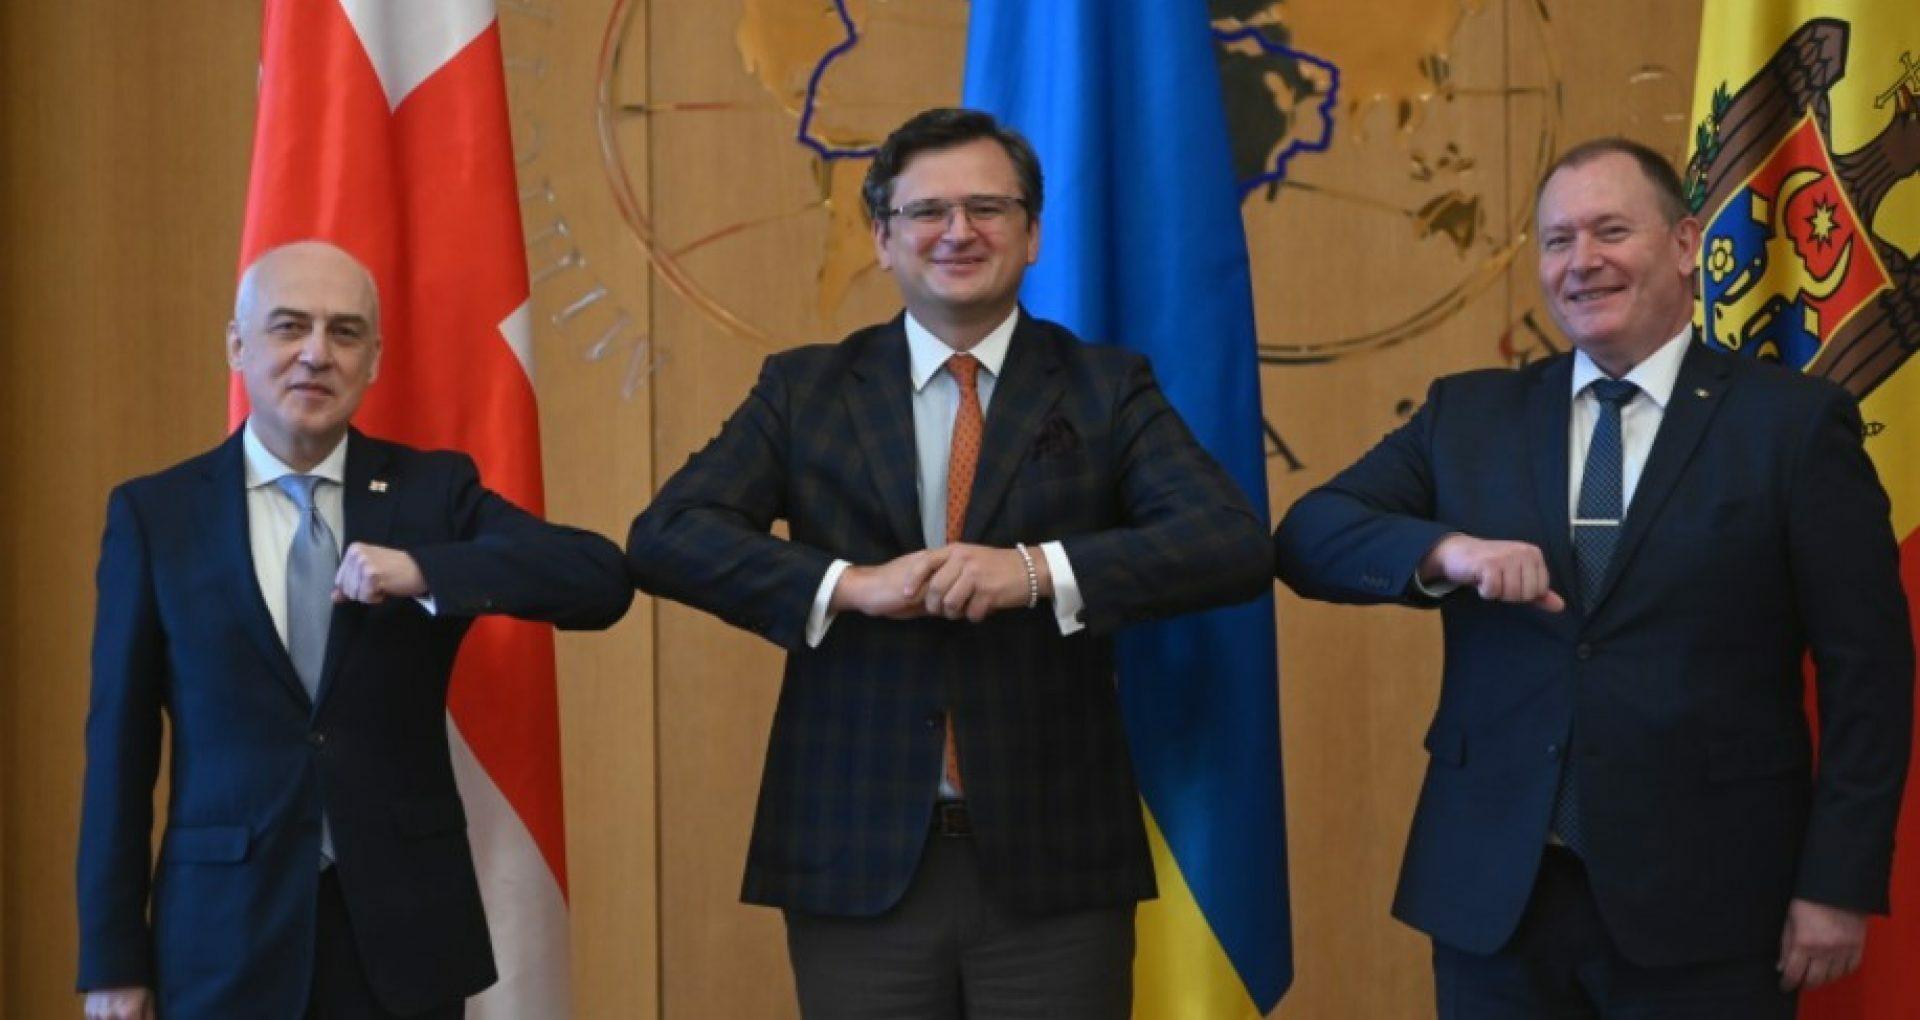 Moldova, Ukraine, and Georgia Signed a Memorandum for Cooperation on European Integration